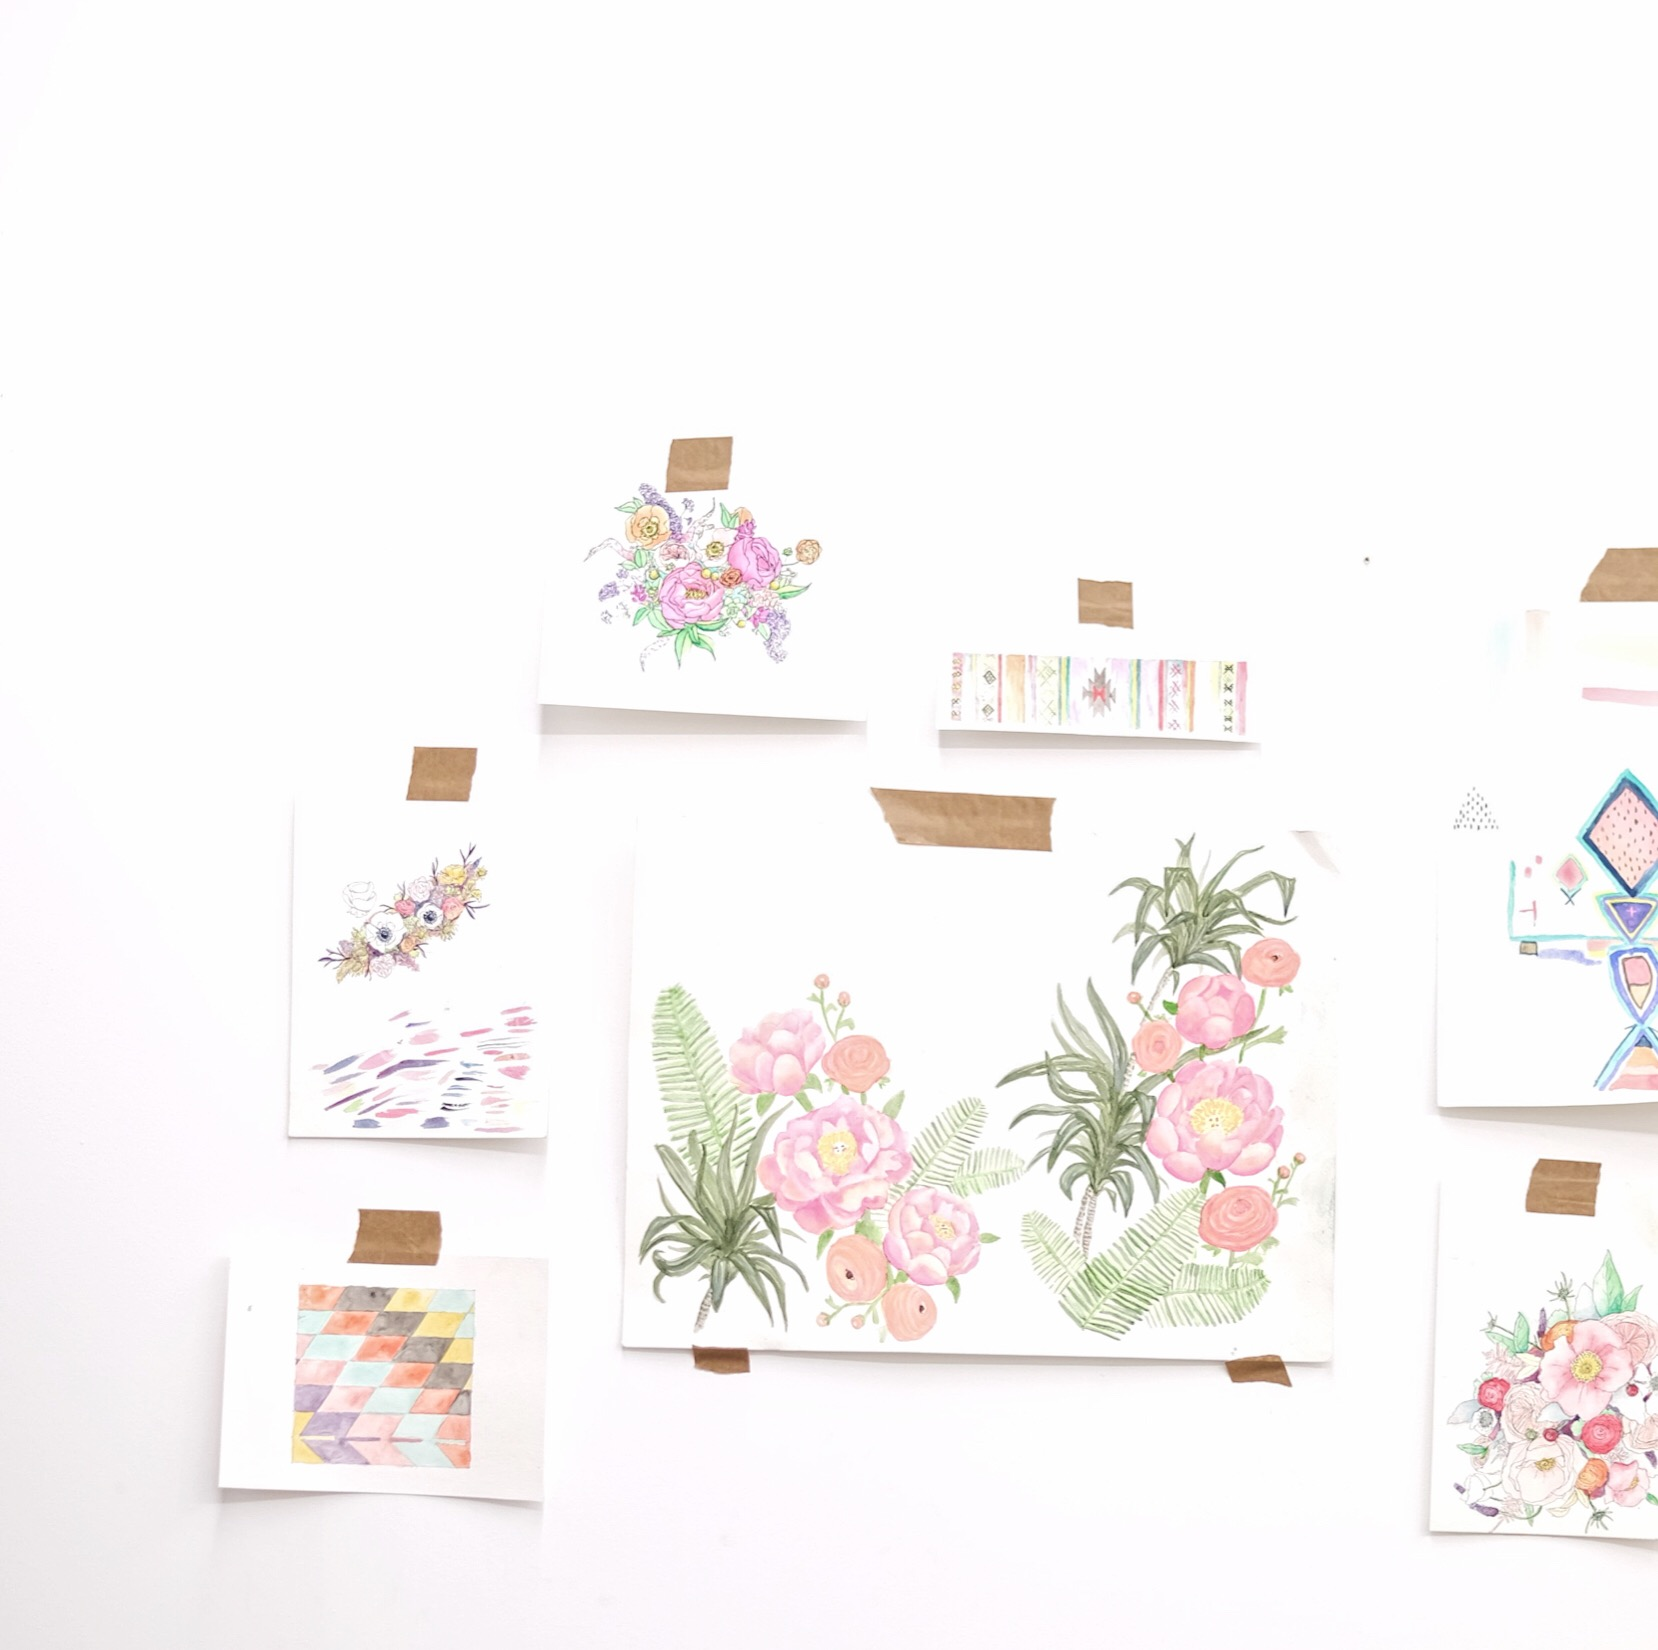 Illustrations by  Samantha Santana